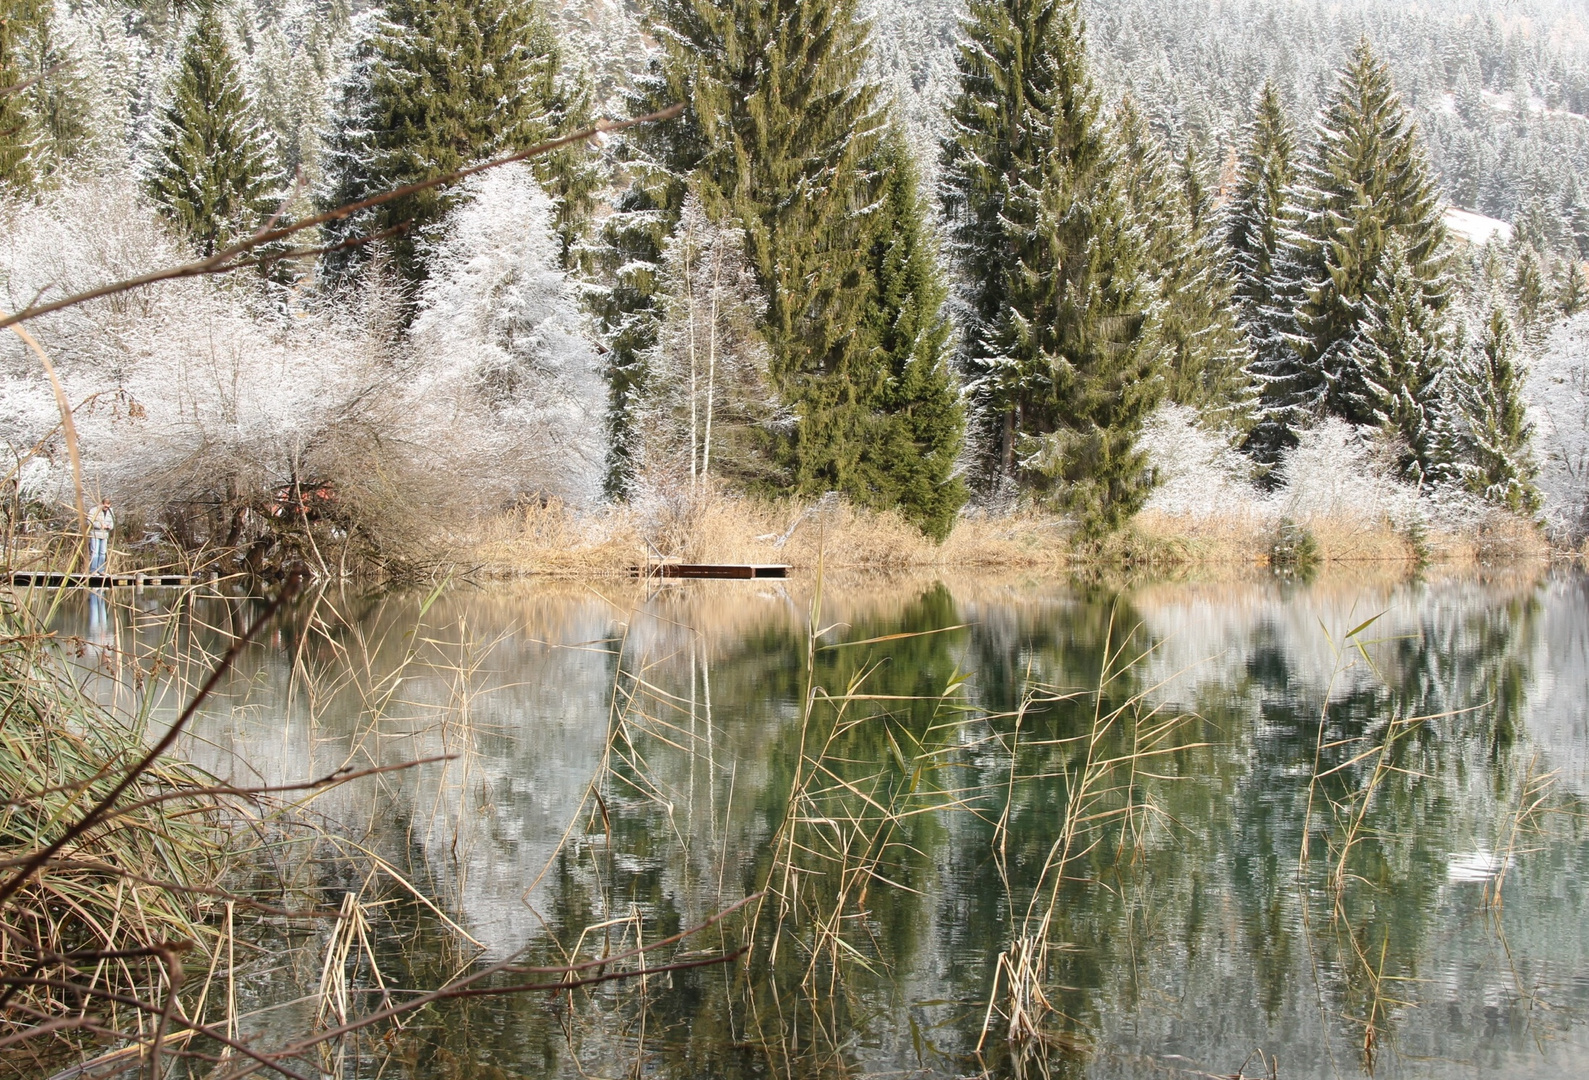 Crestasee November (1)